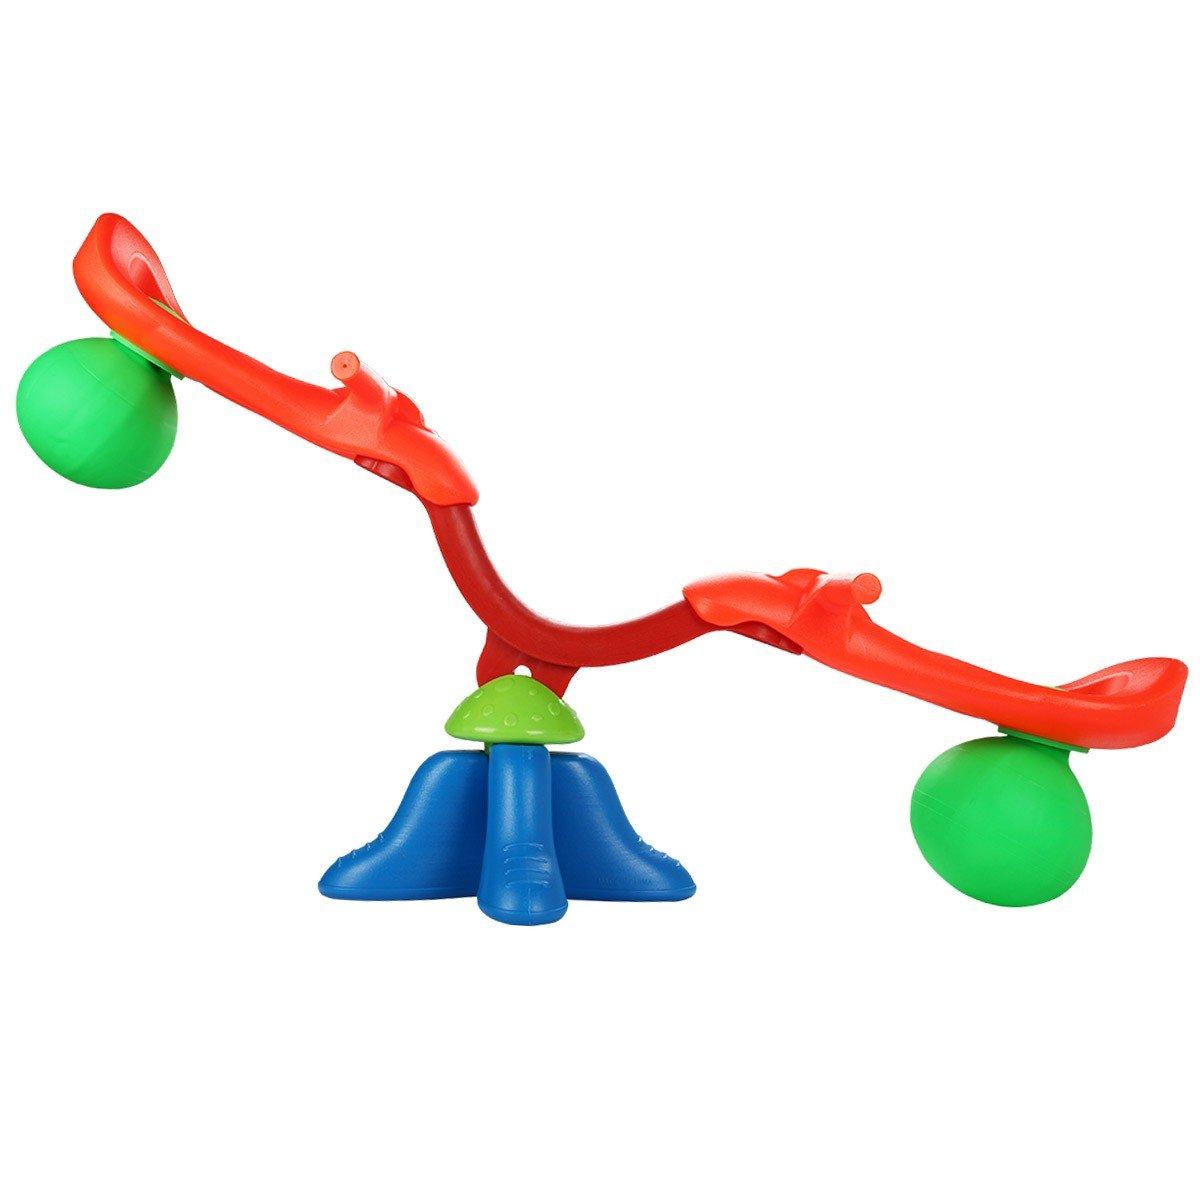 CWY Kids Seesaw 360 Degree Spinning Teeter